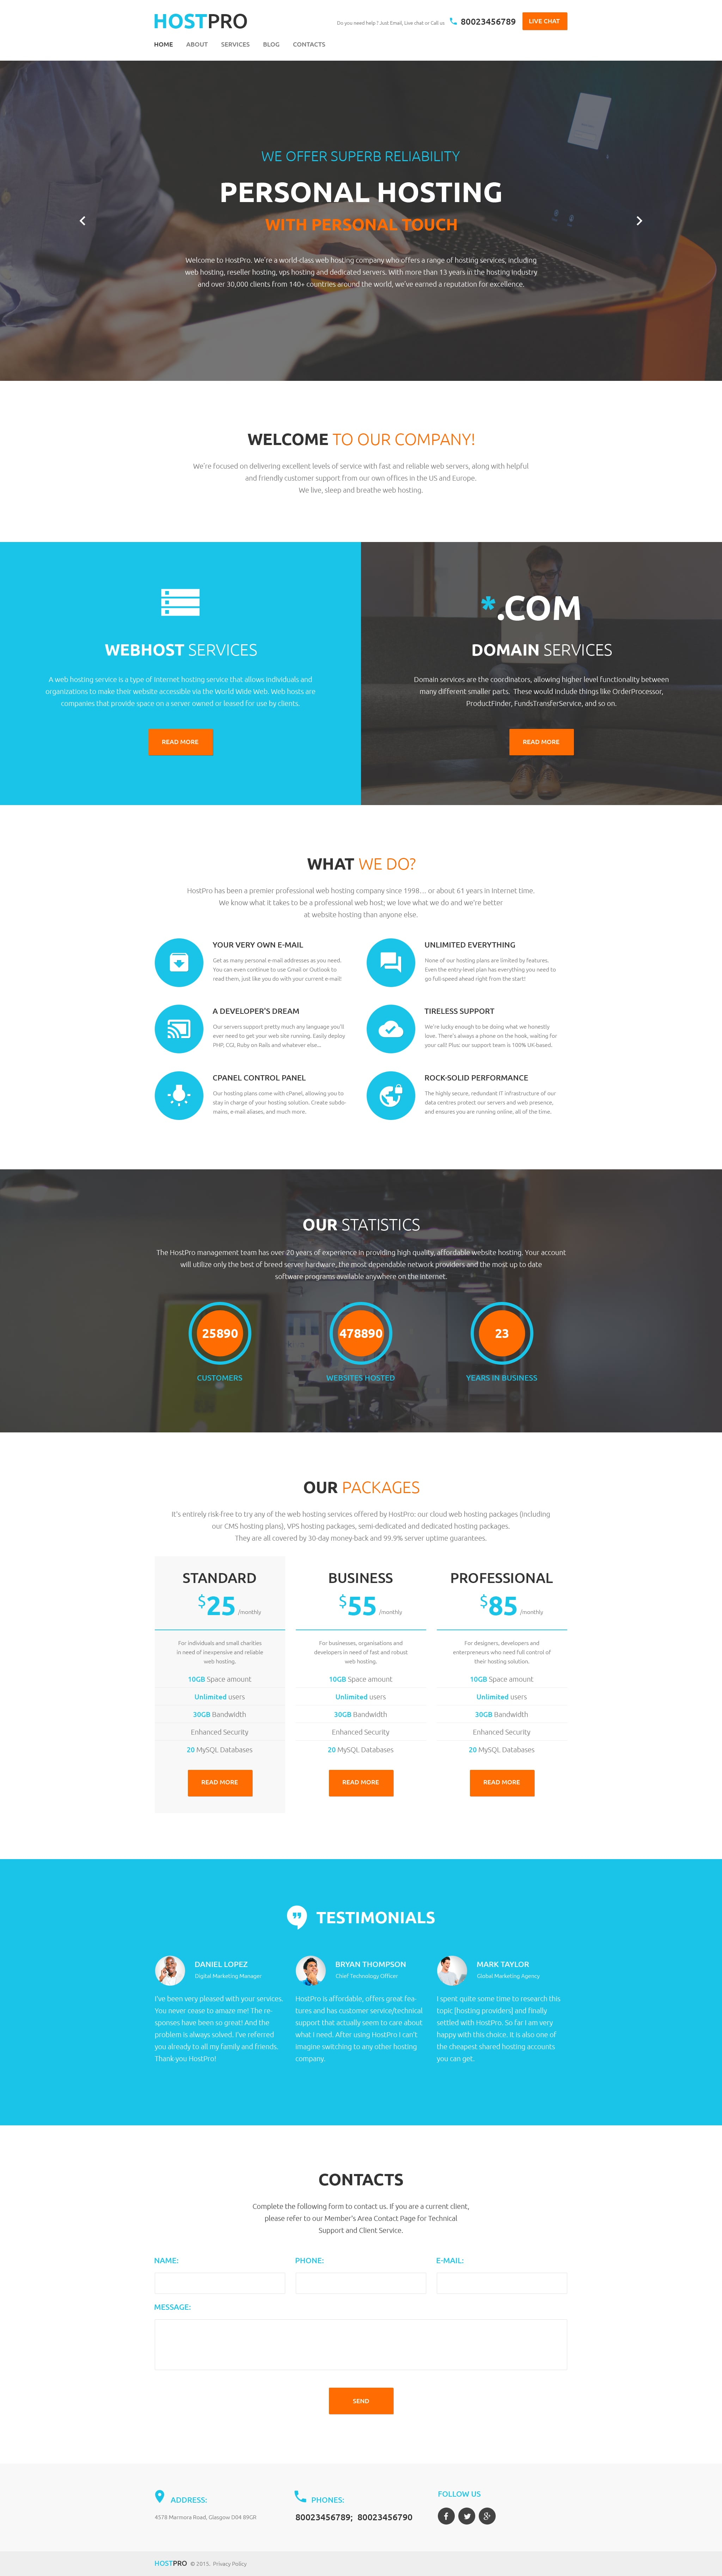 HostPro WordPress Theme